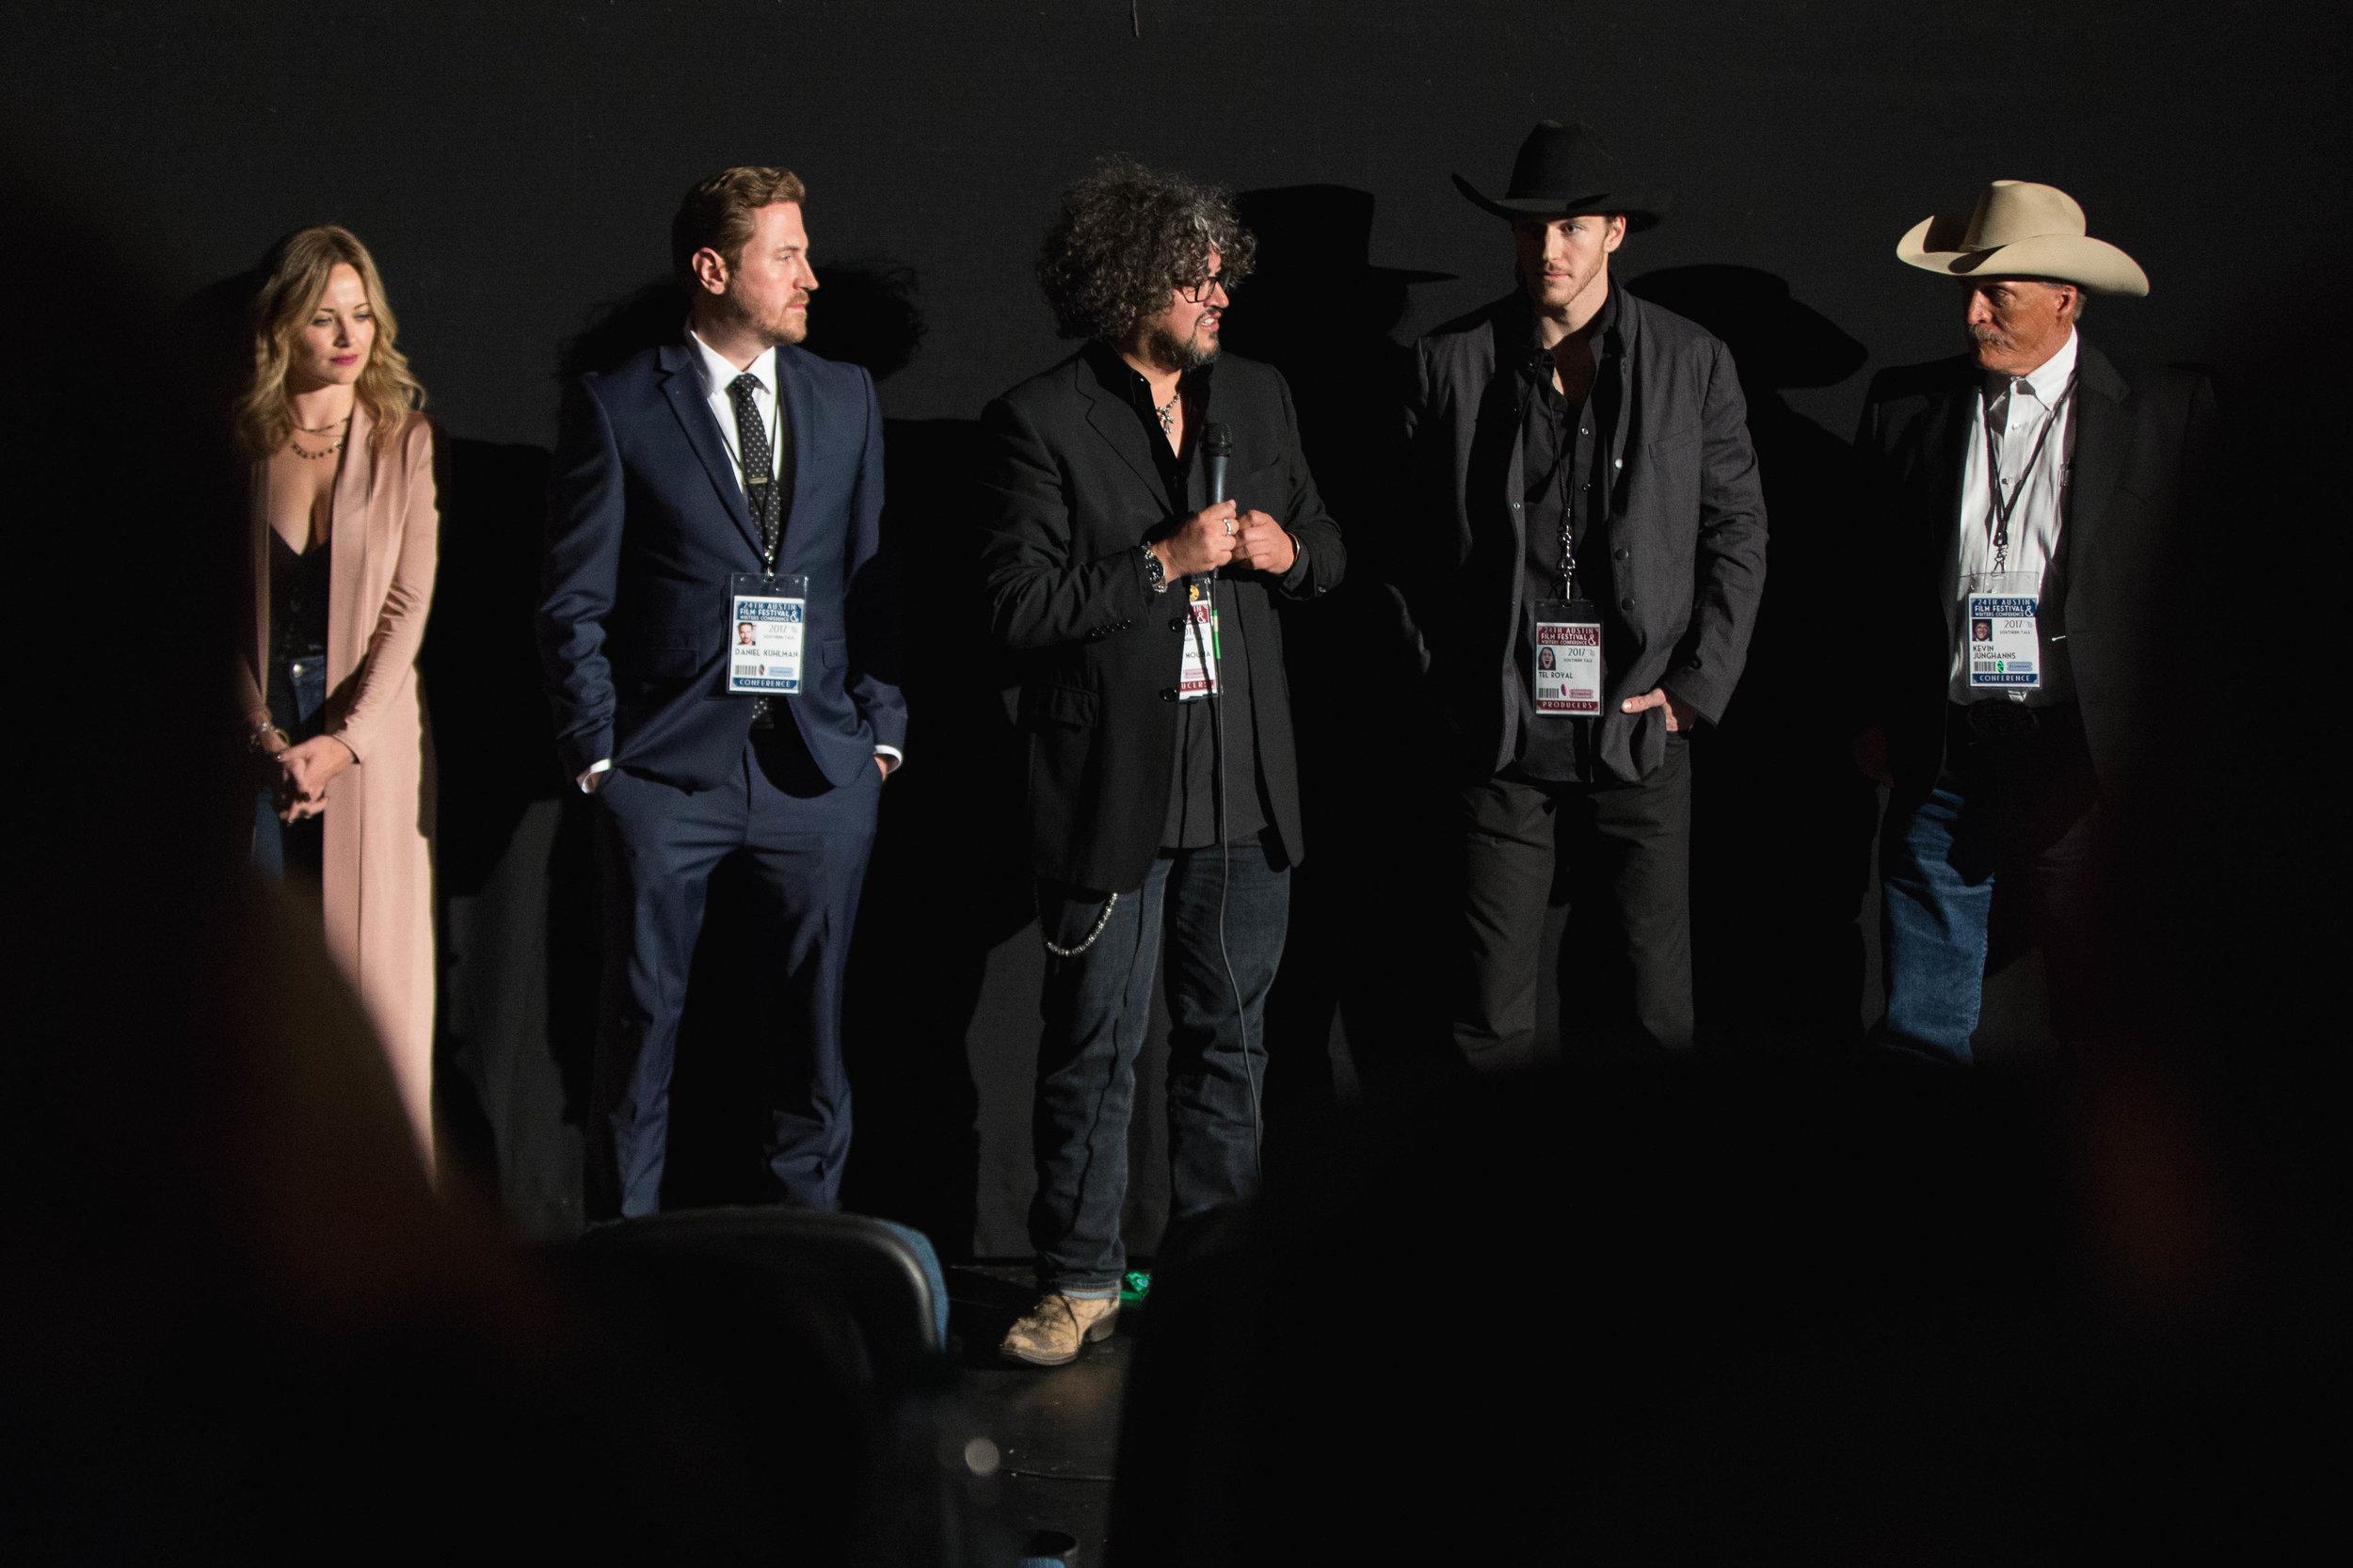 Southern-Tale-Austin-Film-Fest-Kirby-Gladstein-2017-3244.jpg